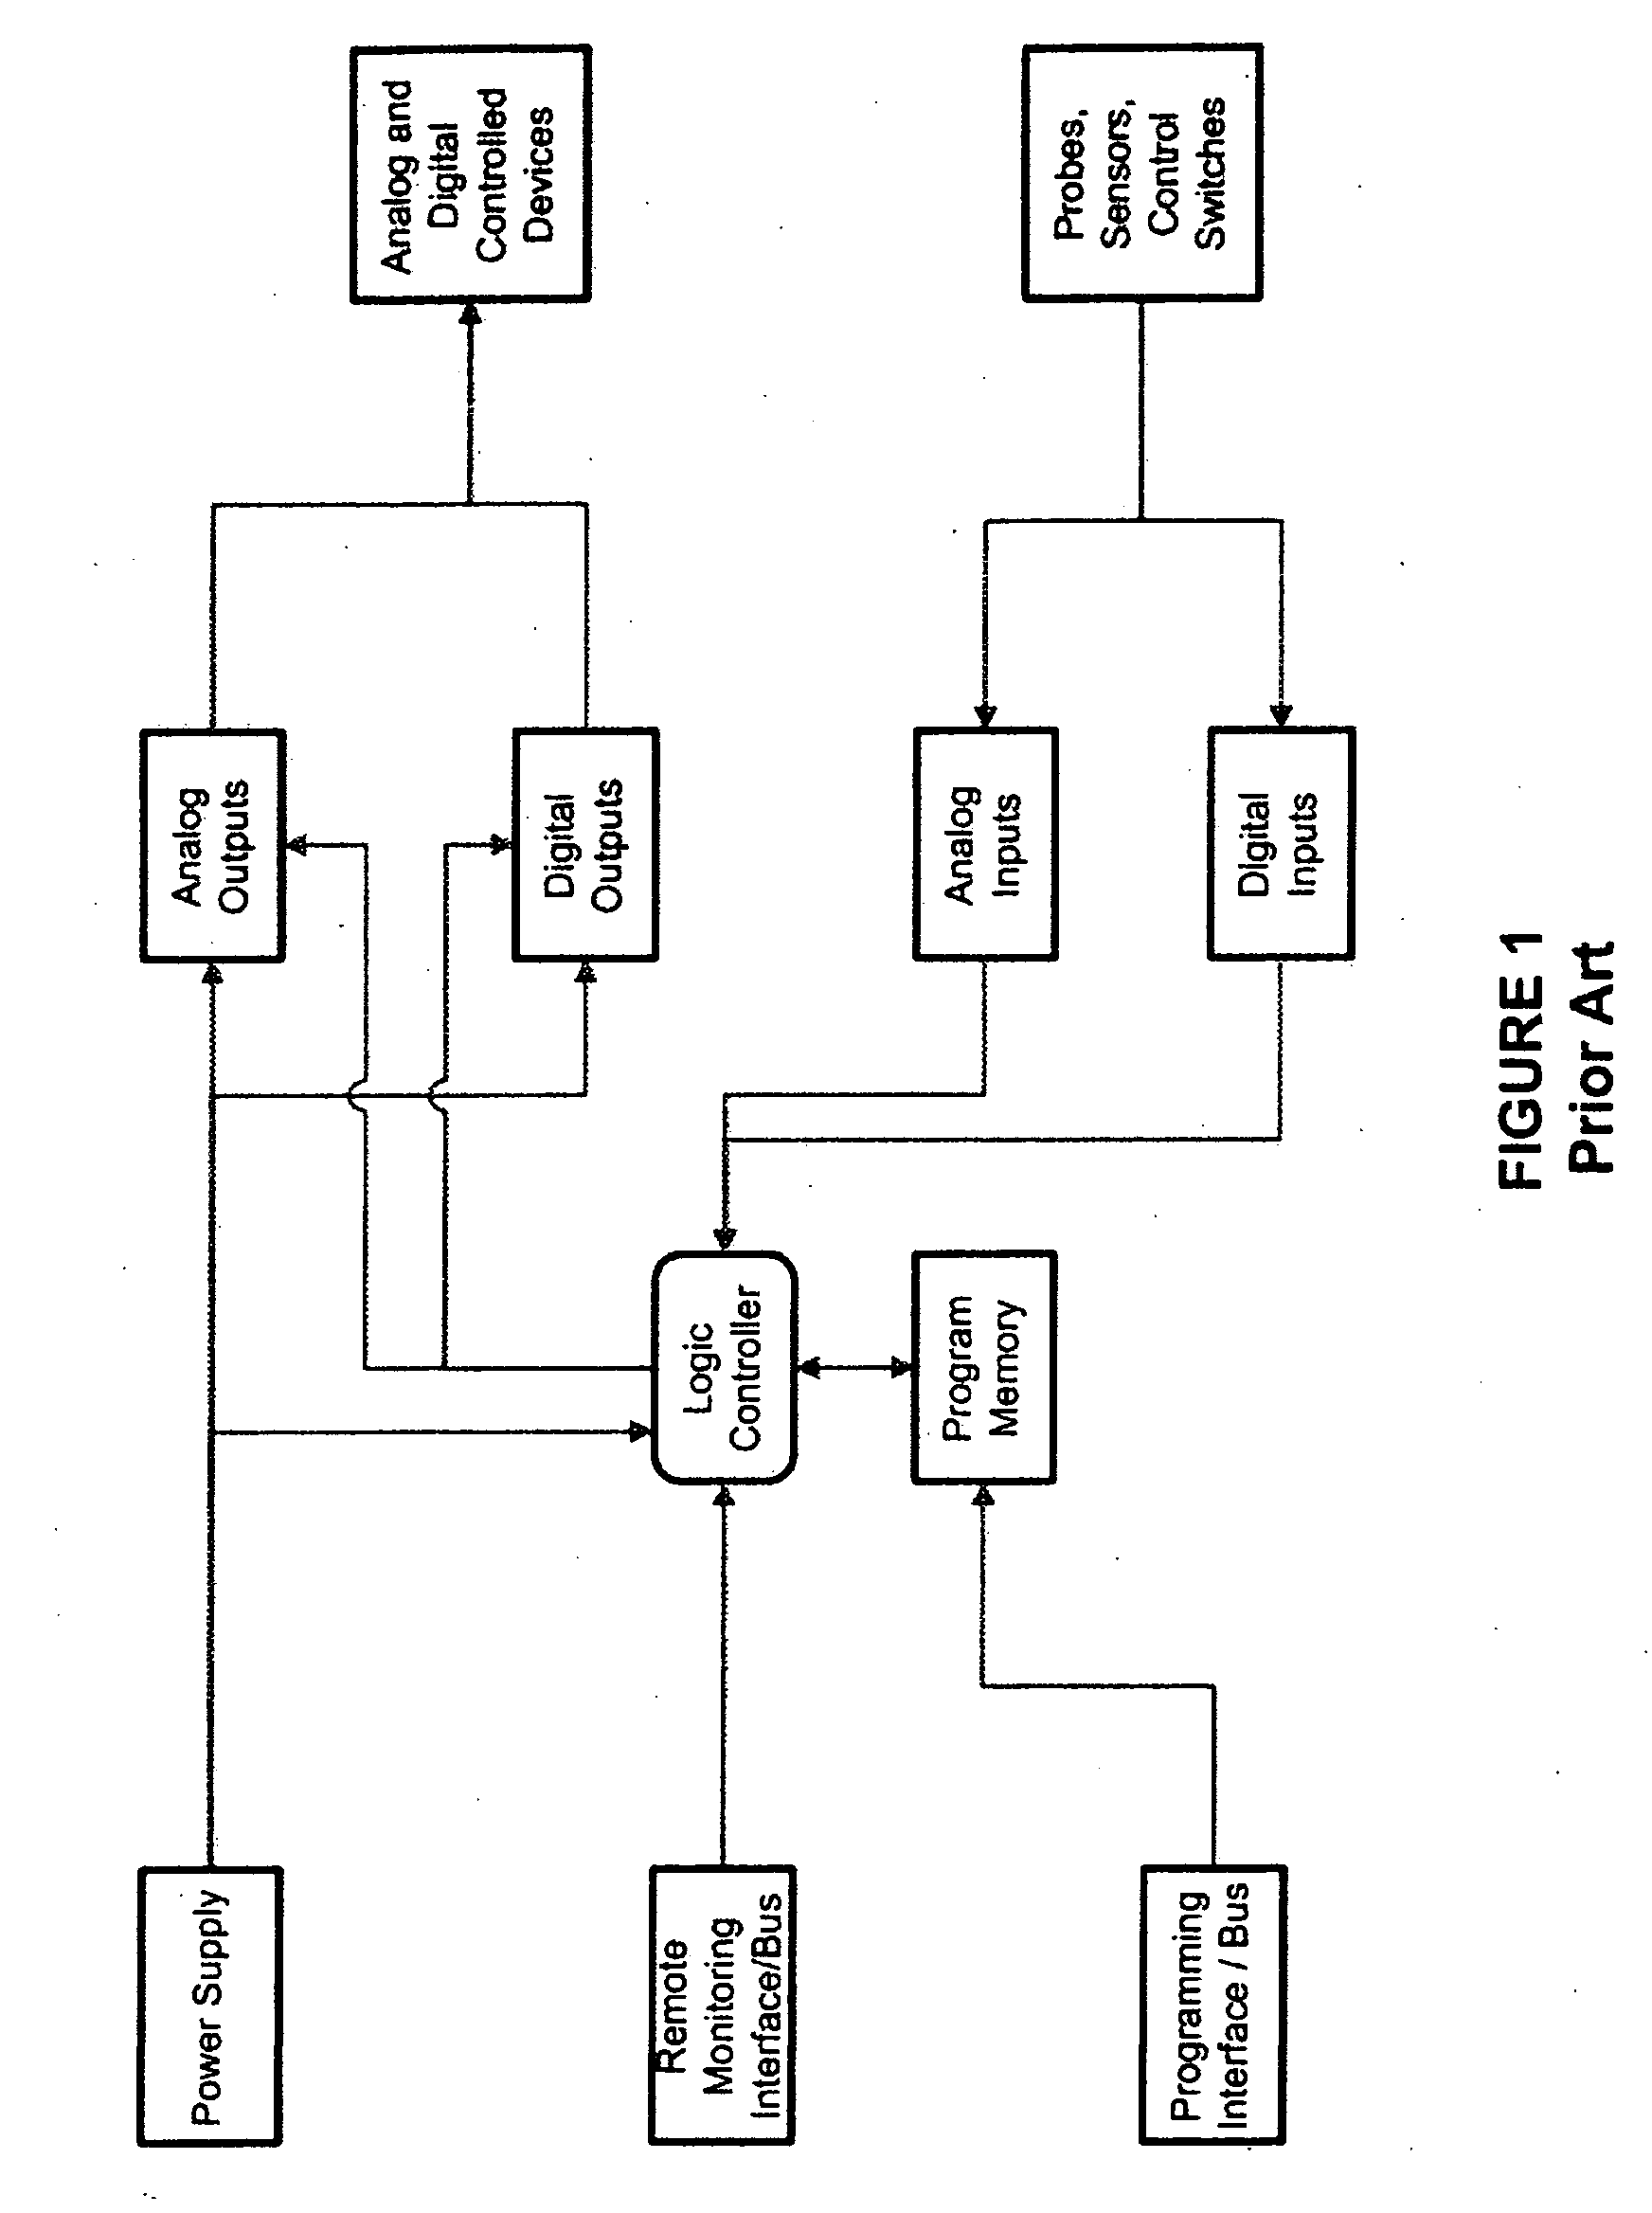 Carrier Rtu Wiring Diagram